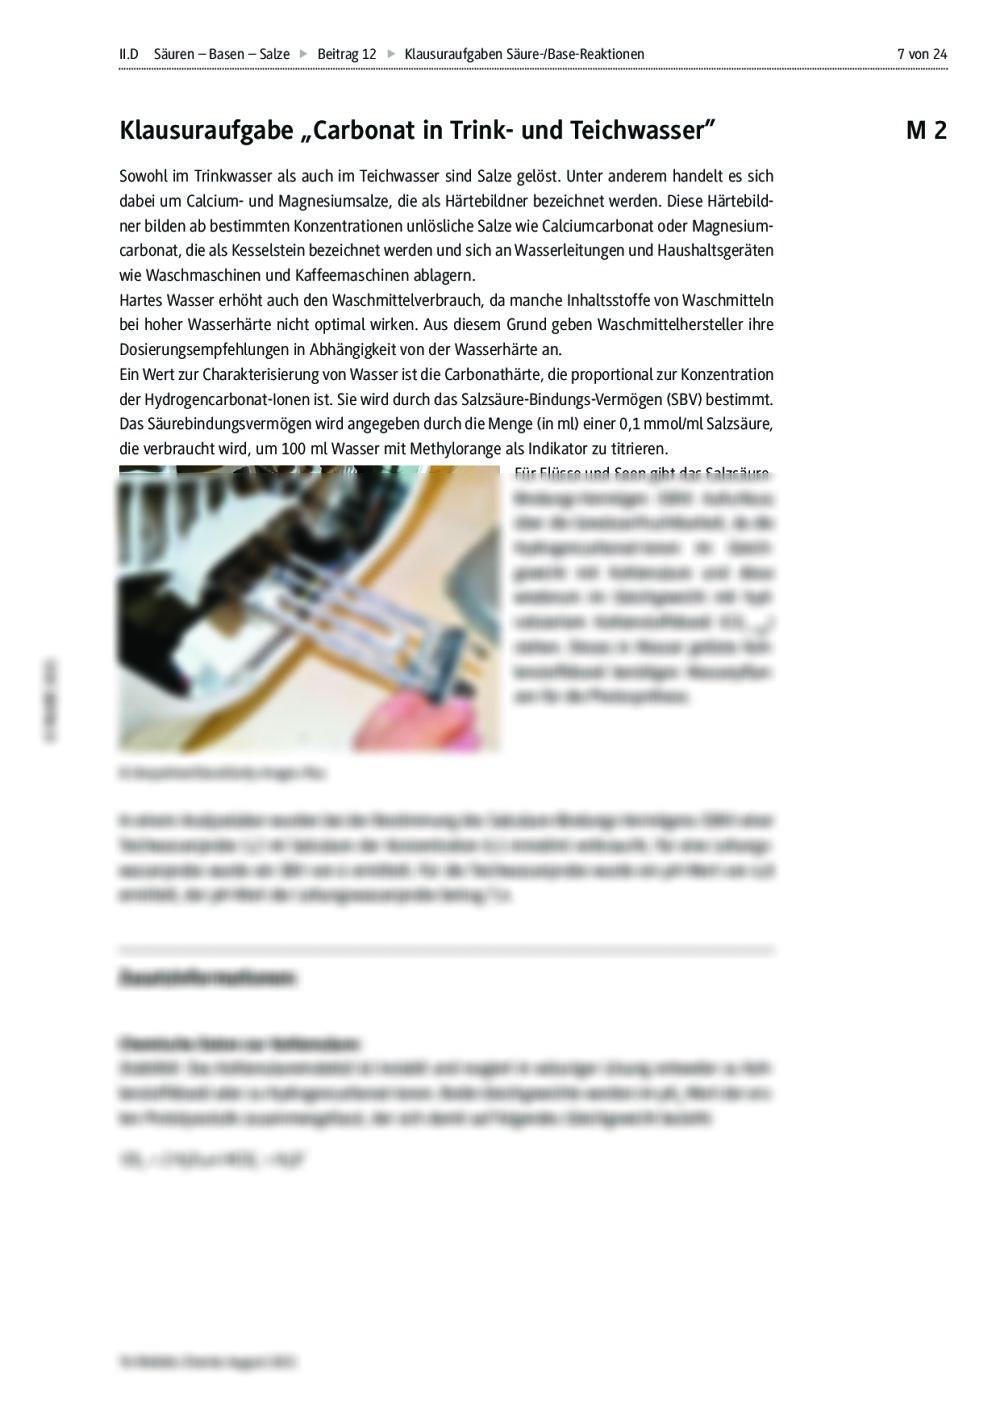 Klausuraufgaben Säure-/Base-Reaktionen | RAAbits Online